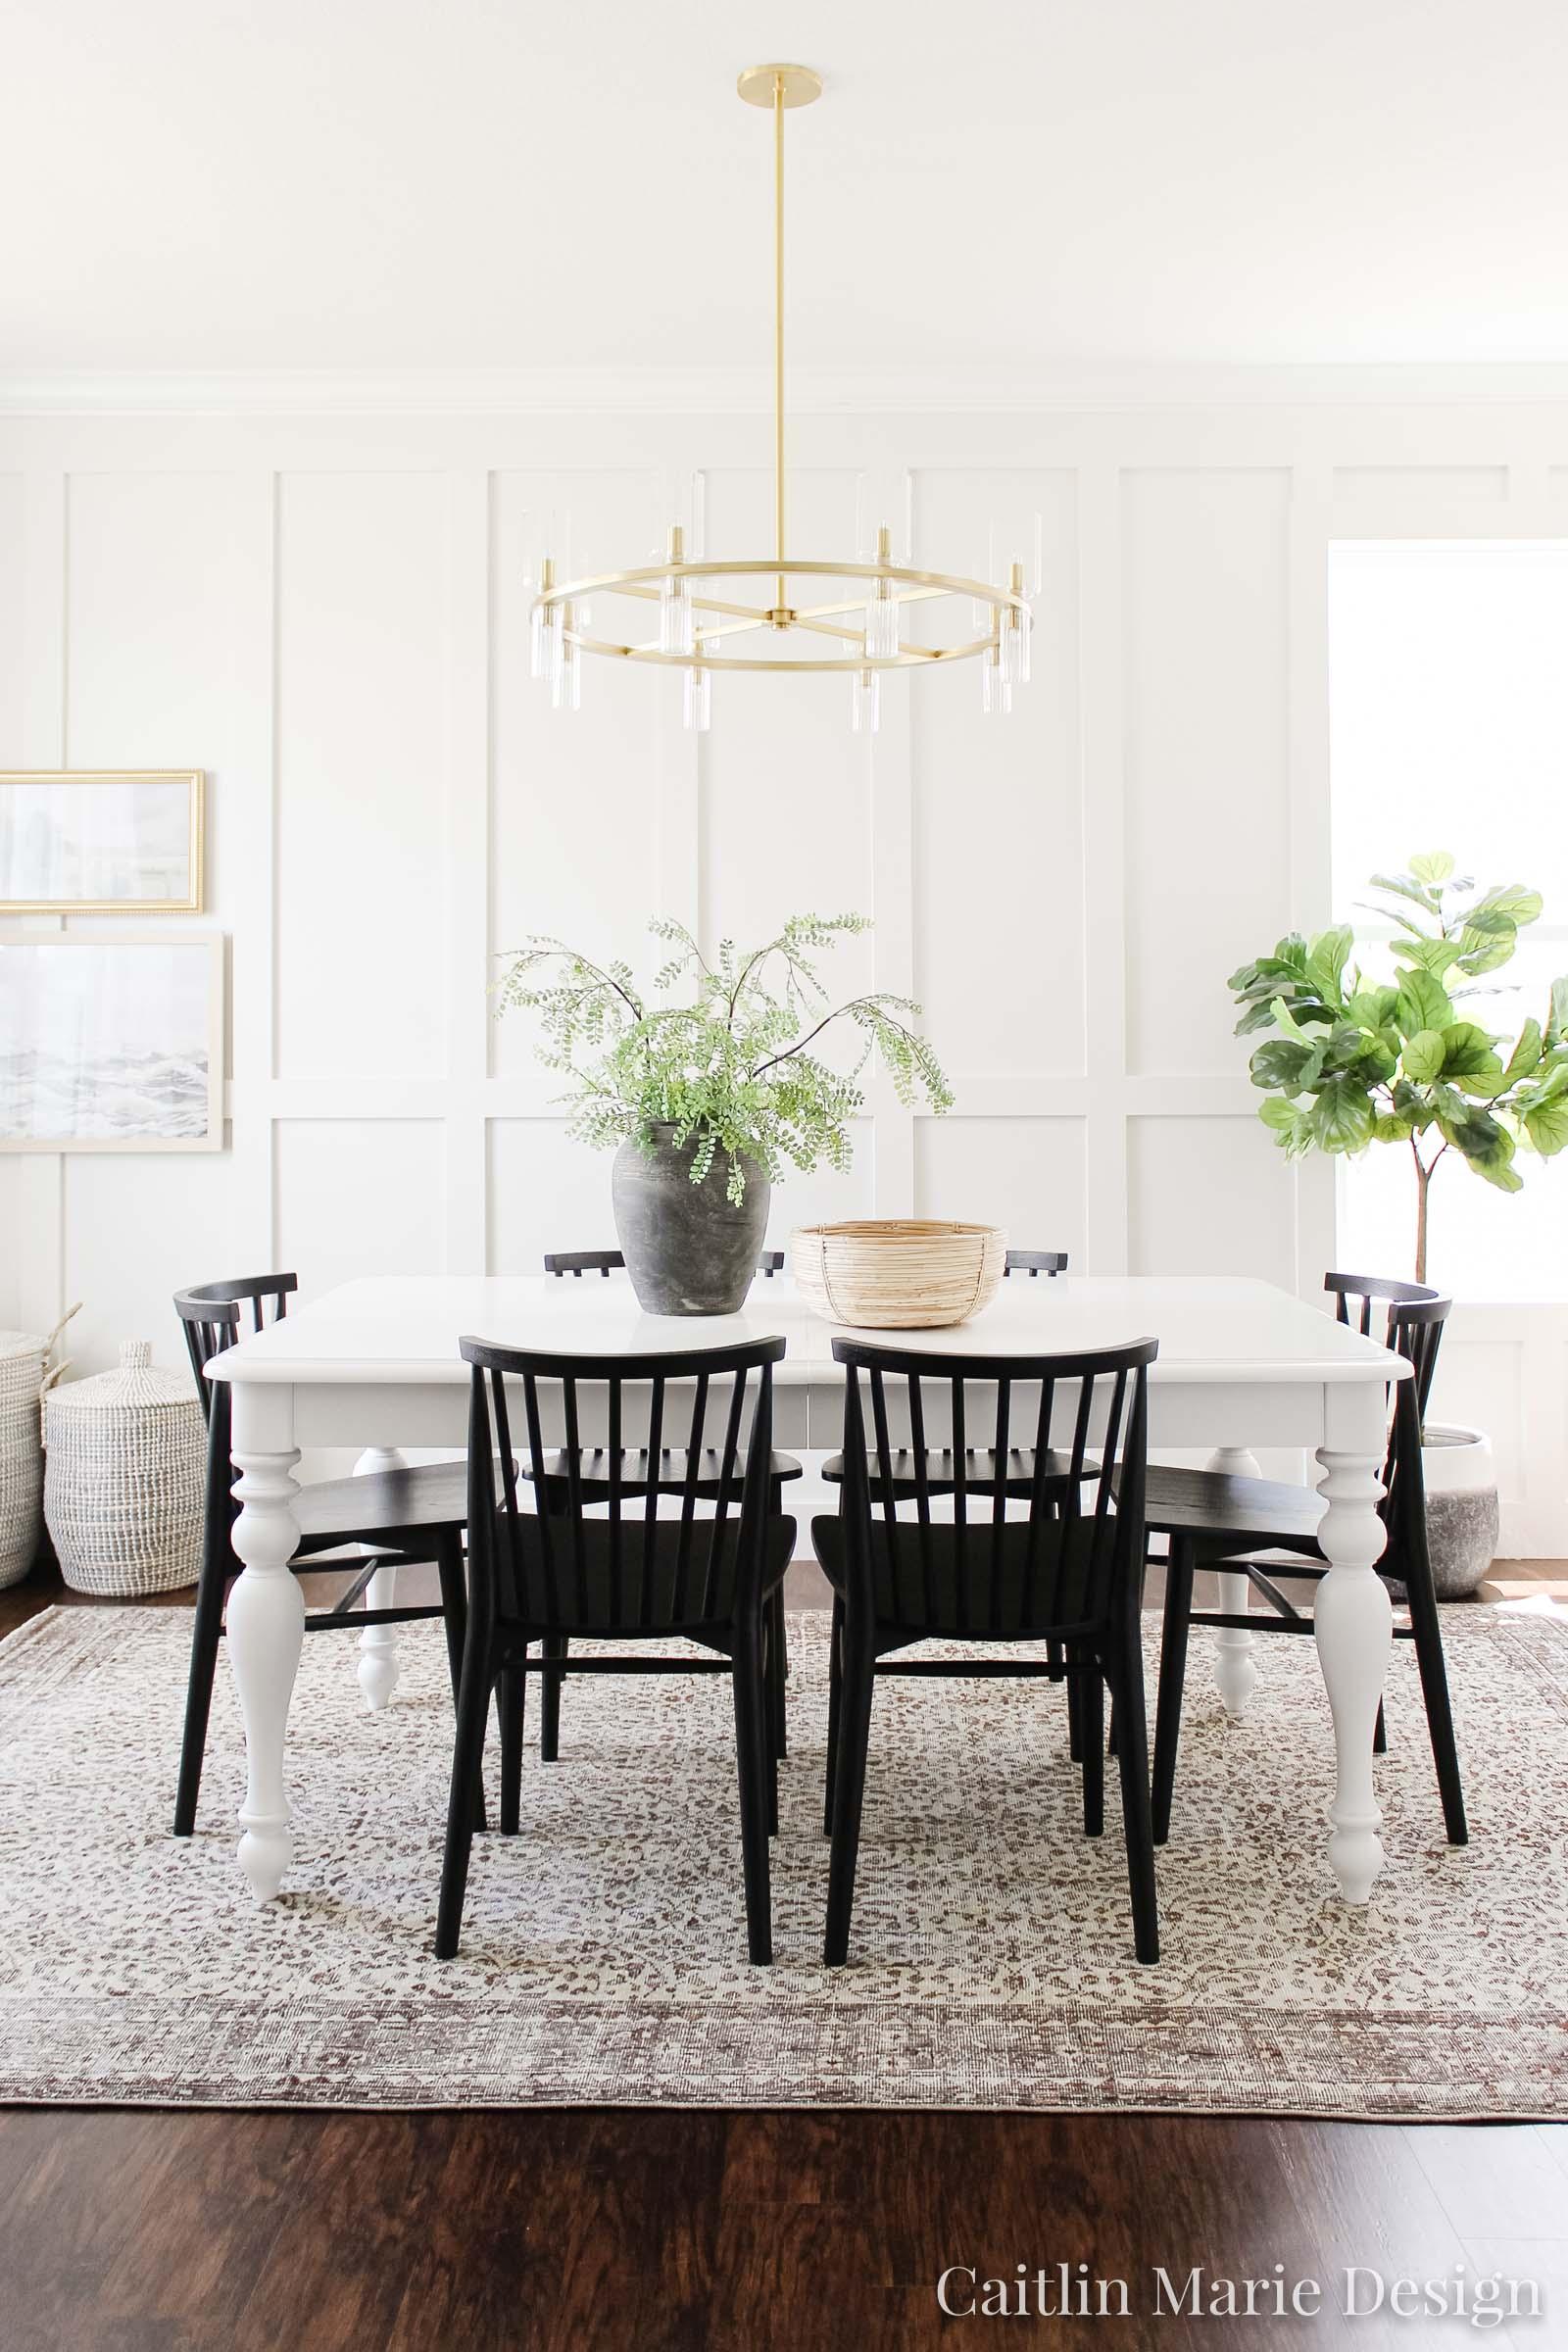 Coastal Dining Room Reveal | One Room Challenge Spring 2020, white farmhouse table, black Windsor dining chairs, brown vintage rug, brass modern chandelier, coastal landscape artwork, budget decor, coastal decor